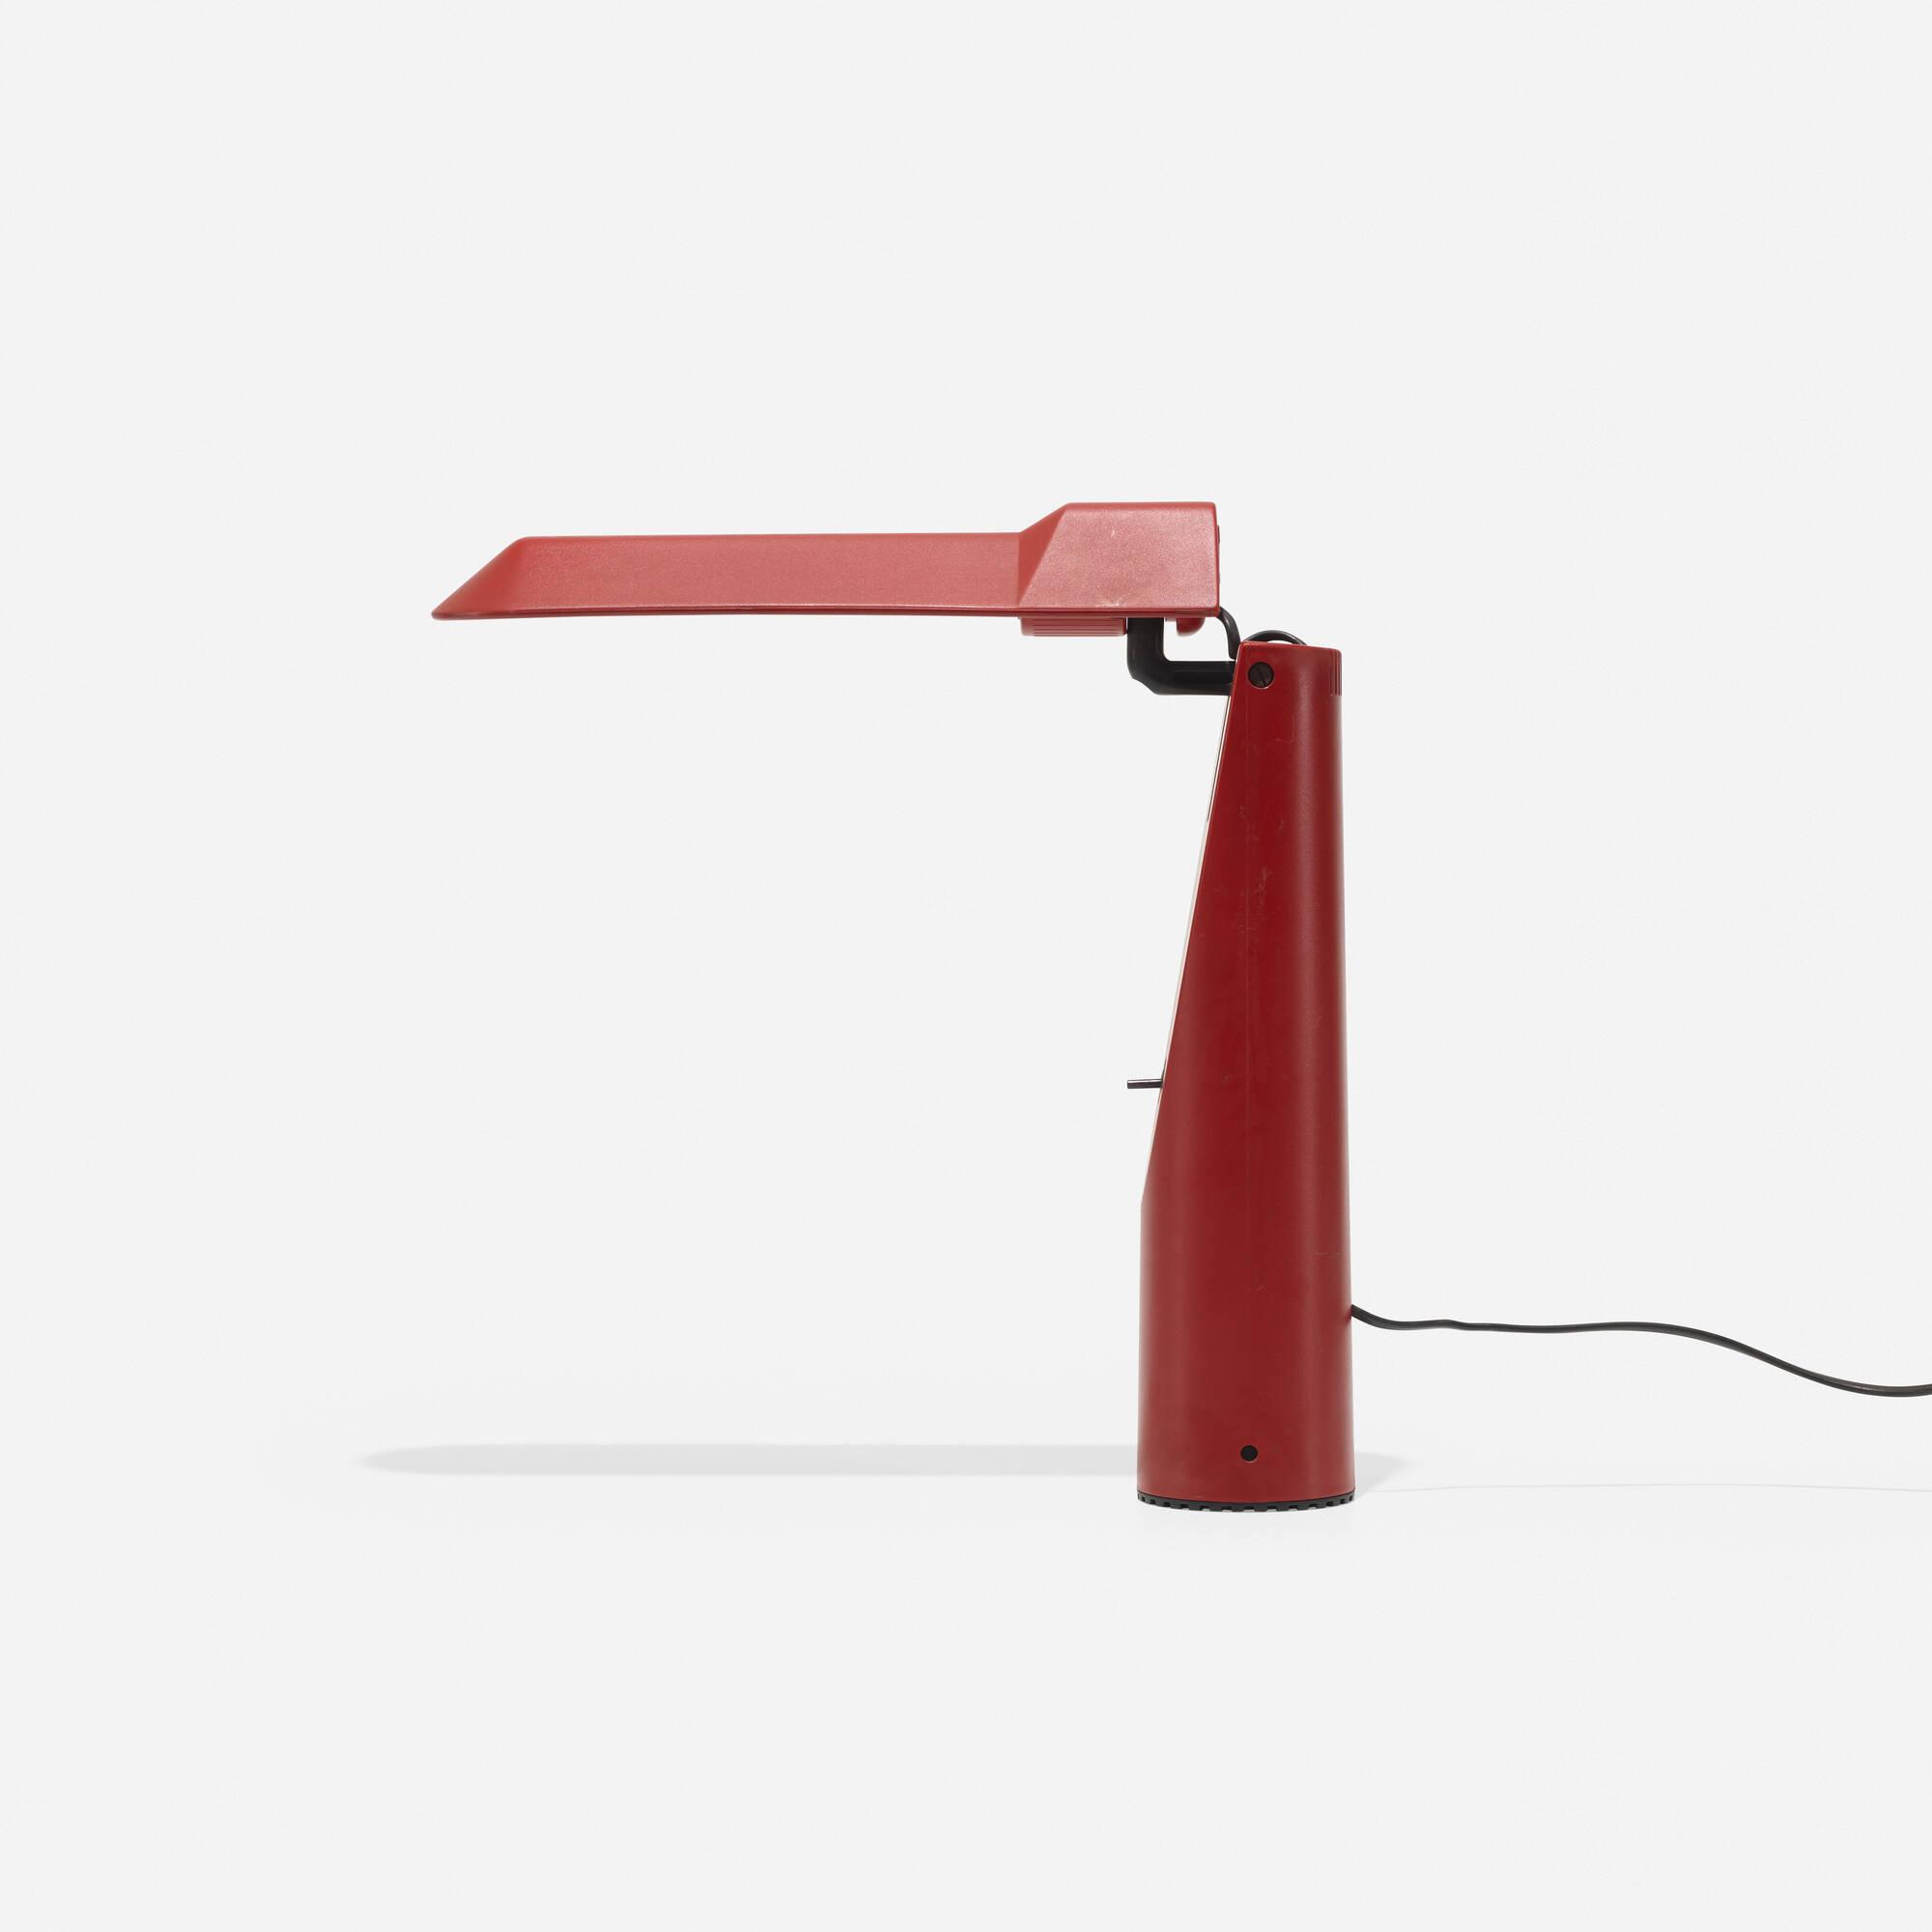 316: Isao Hosoe / Picchio table lamp (1 of 3)